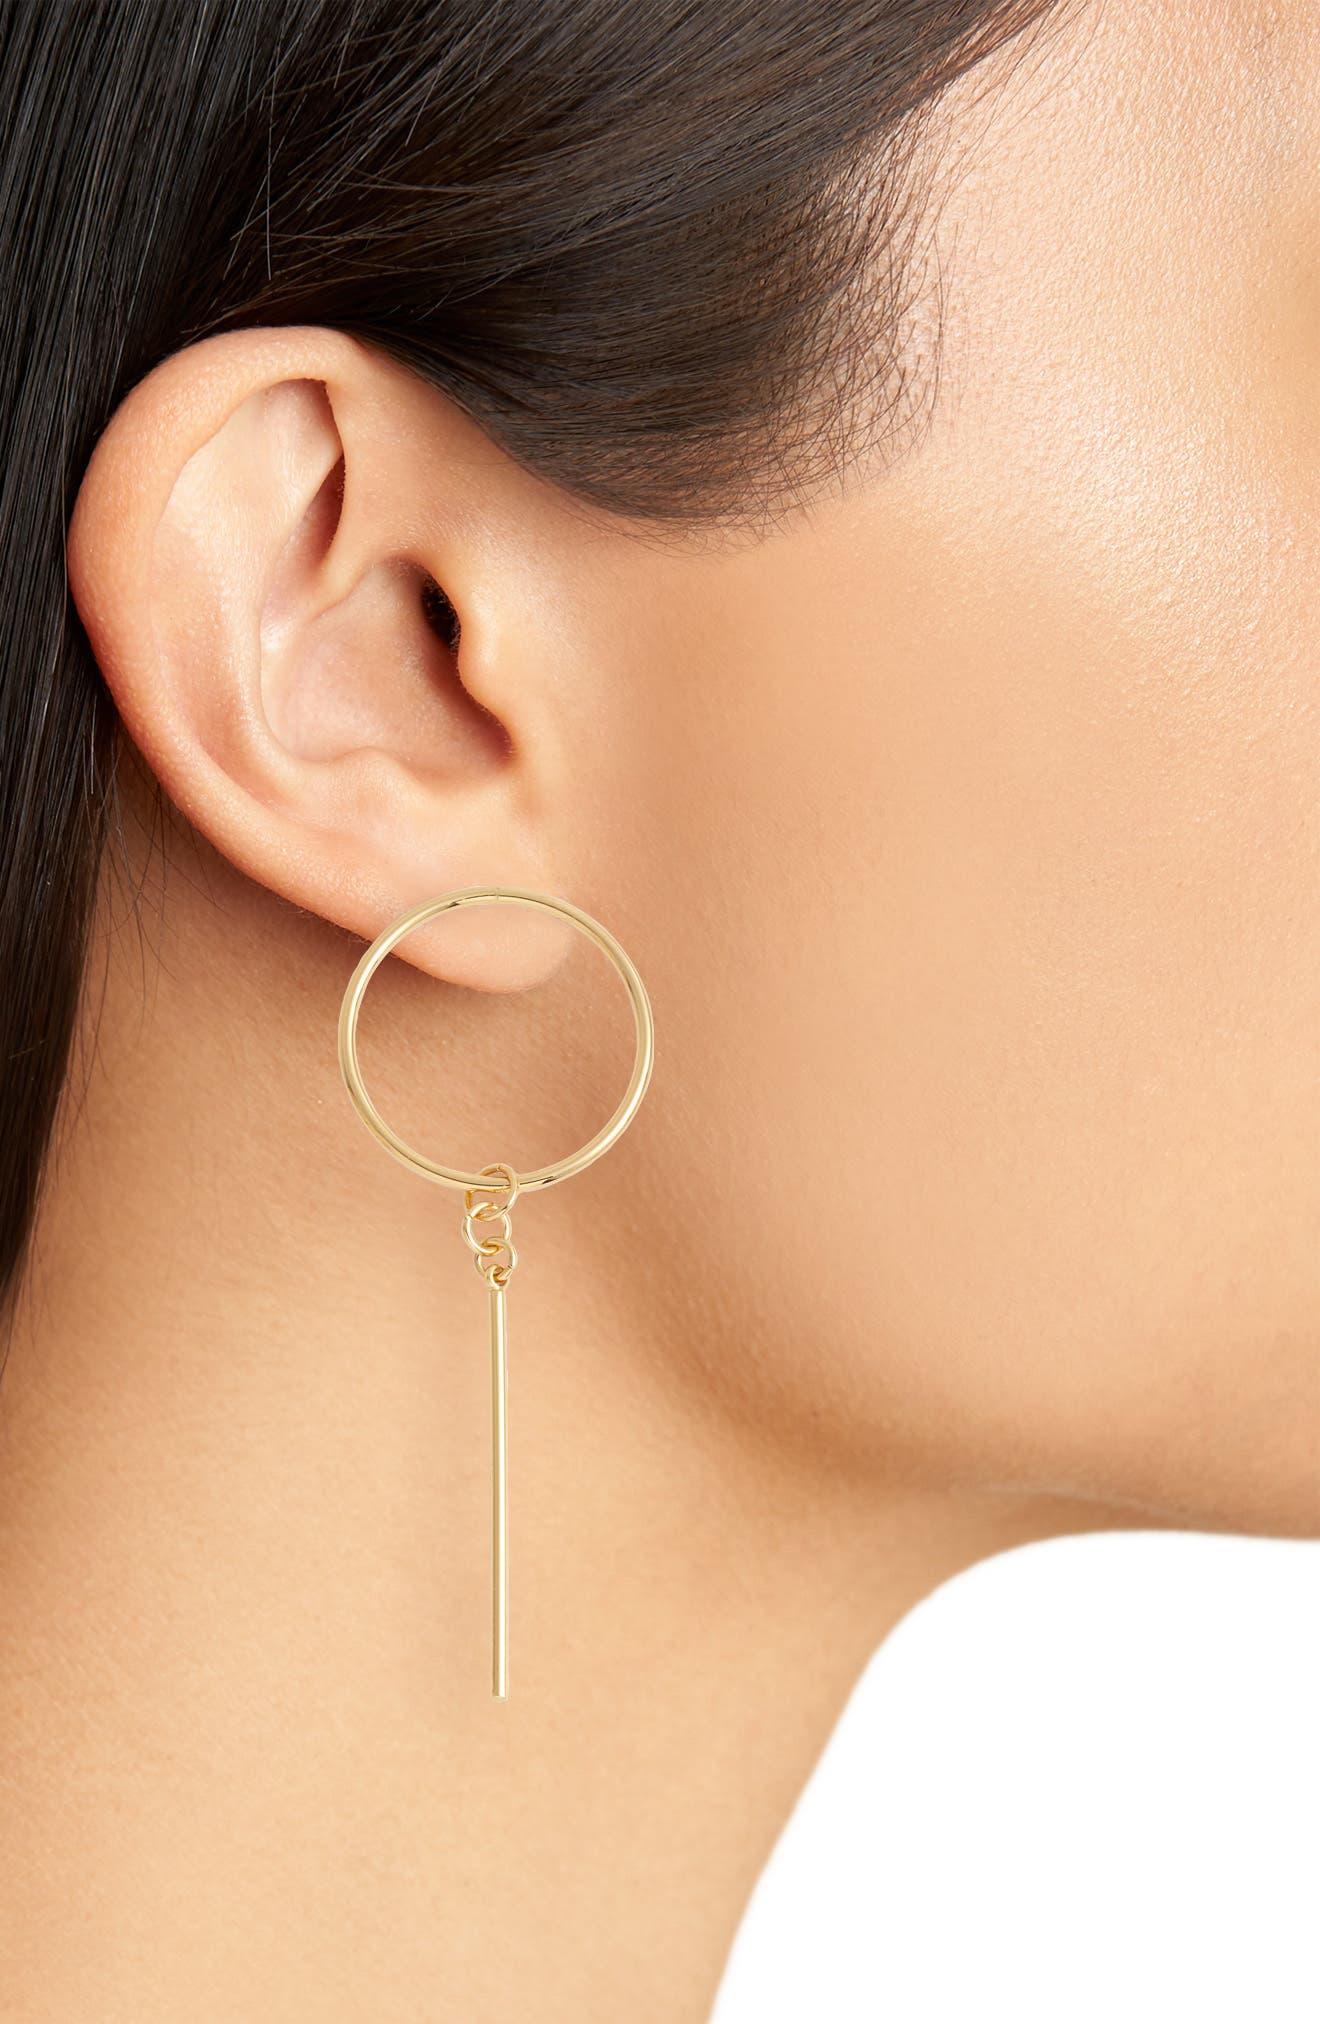 Rhapsody Earrings,                             Alternate thumbnail 3, color,                             Gold